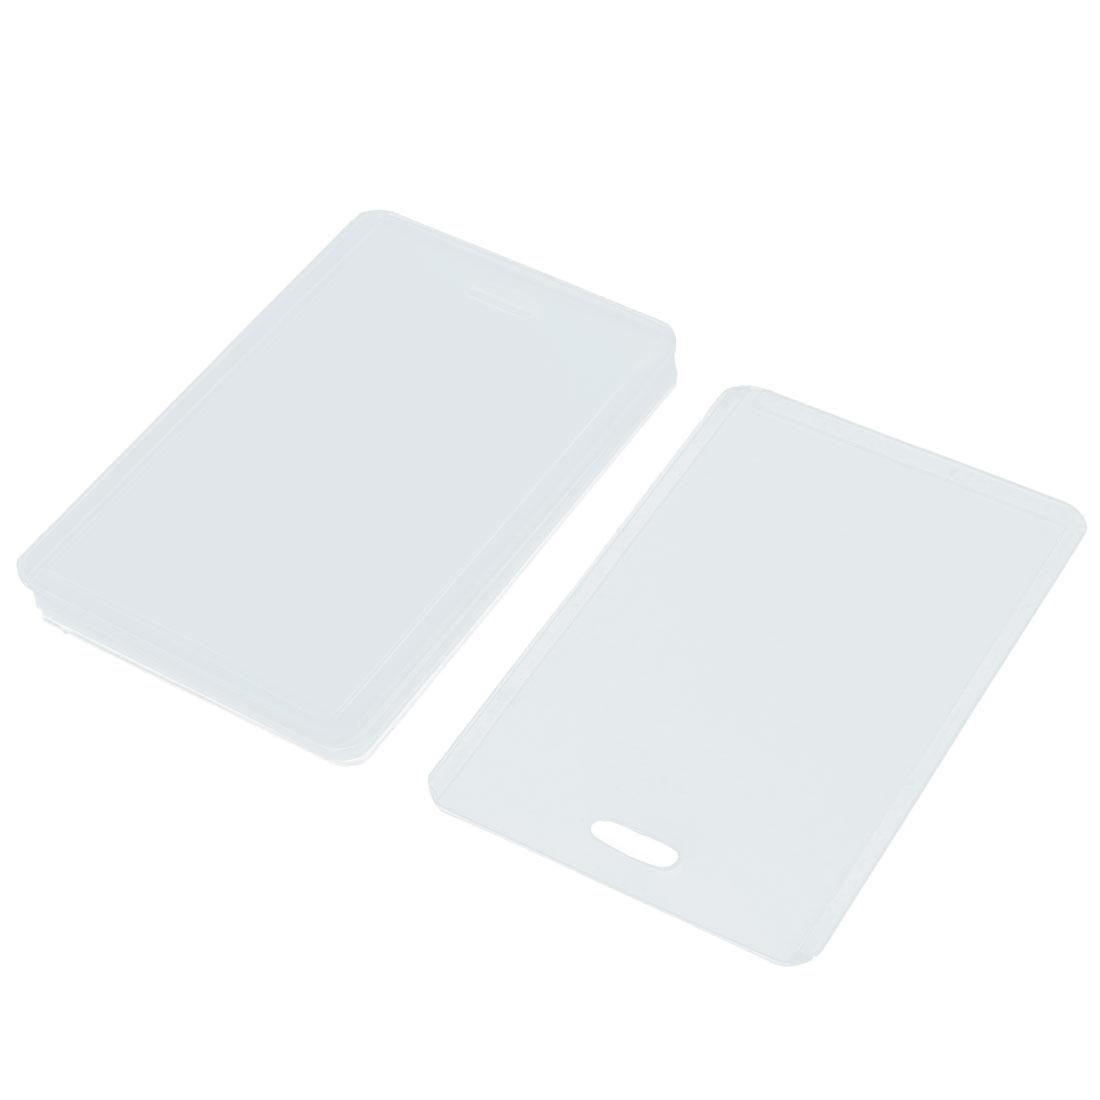 8pcs Vertical Transparent Plastic Business Credit ID Card Holder Cases